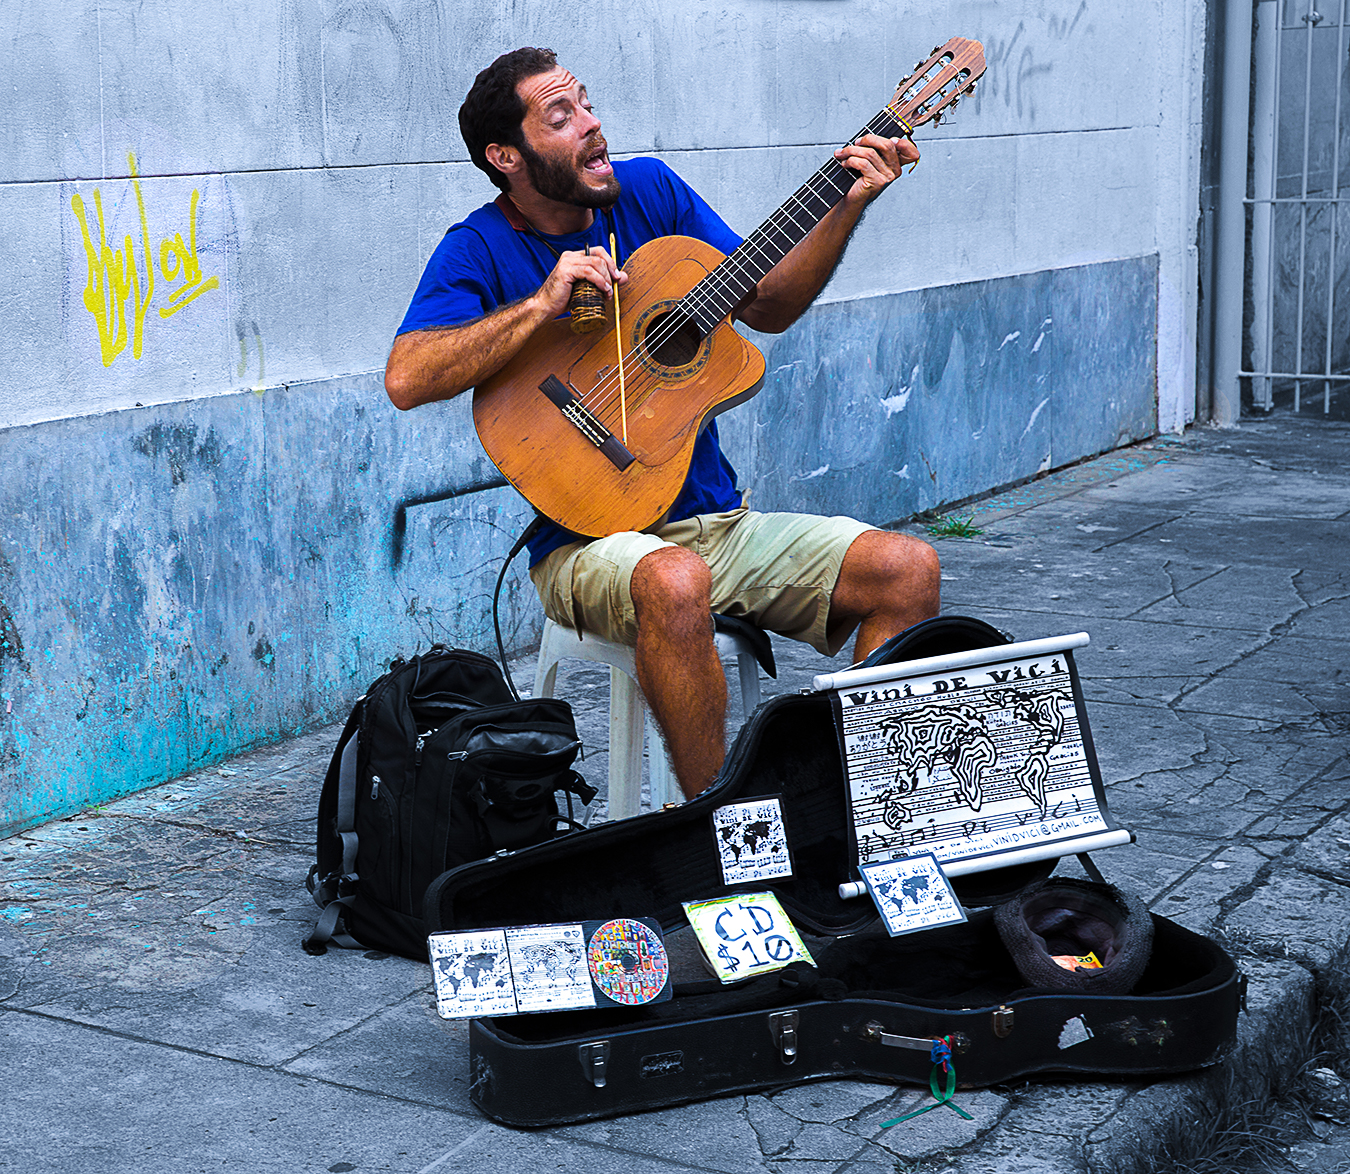 Rongrong Liu_Brazil_Rio De Janeiro_Farvela_A Passionate Musician